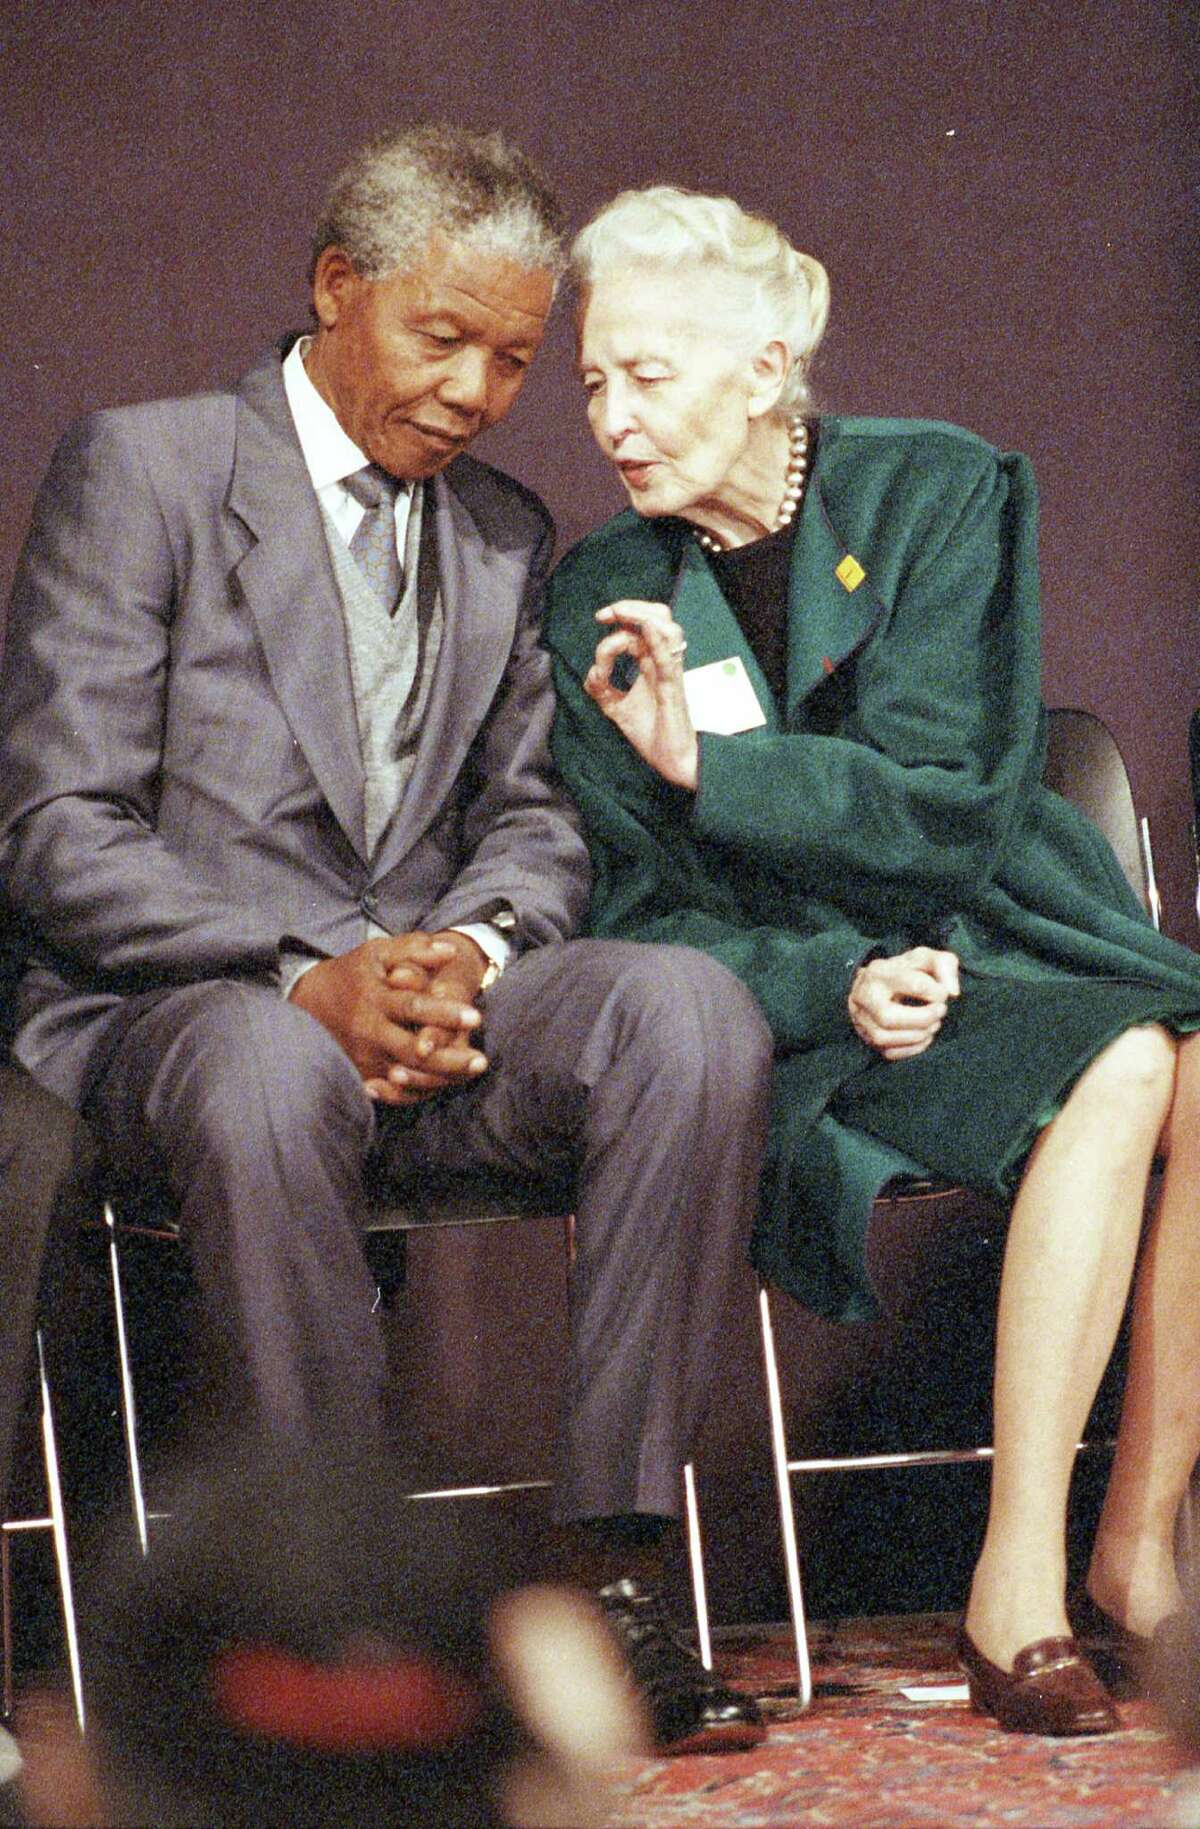 12/07/1991 - Nelson Mandela and Dominique de Menil at a press conference at the Rothko Chapel, Dec. 7, 1991.